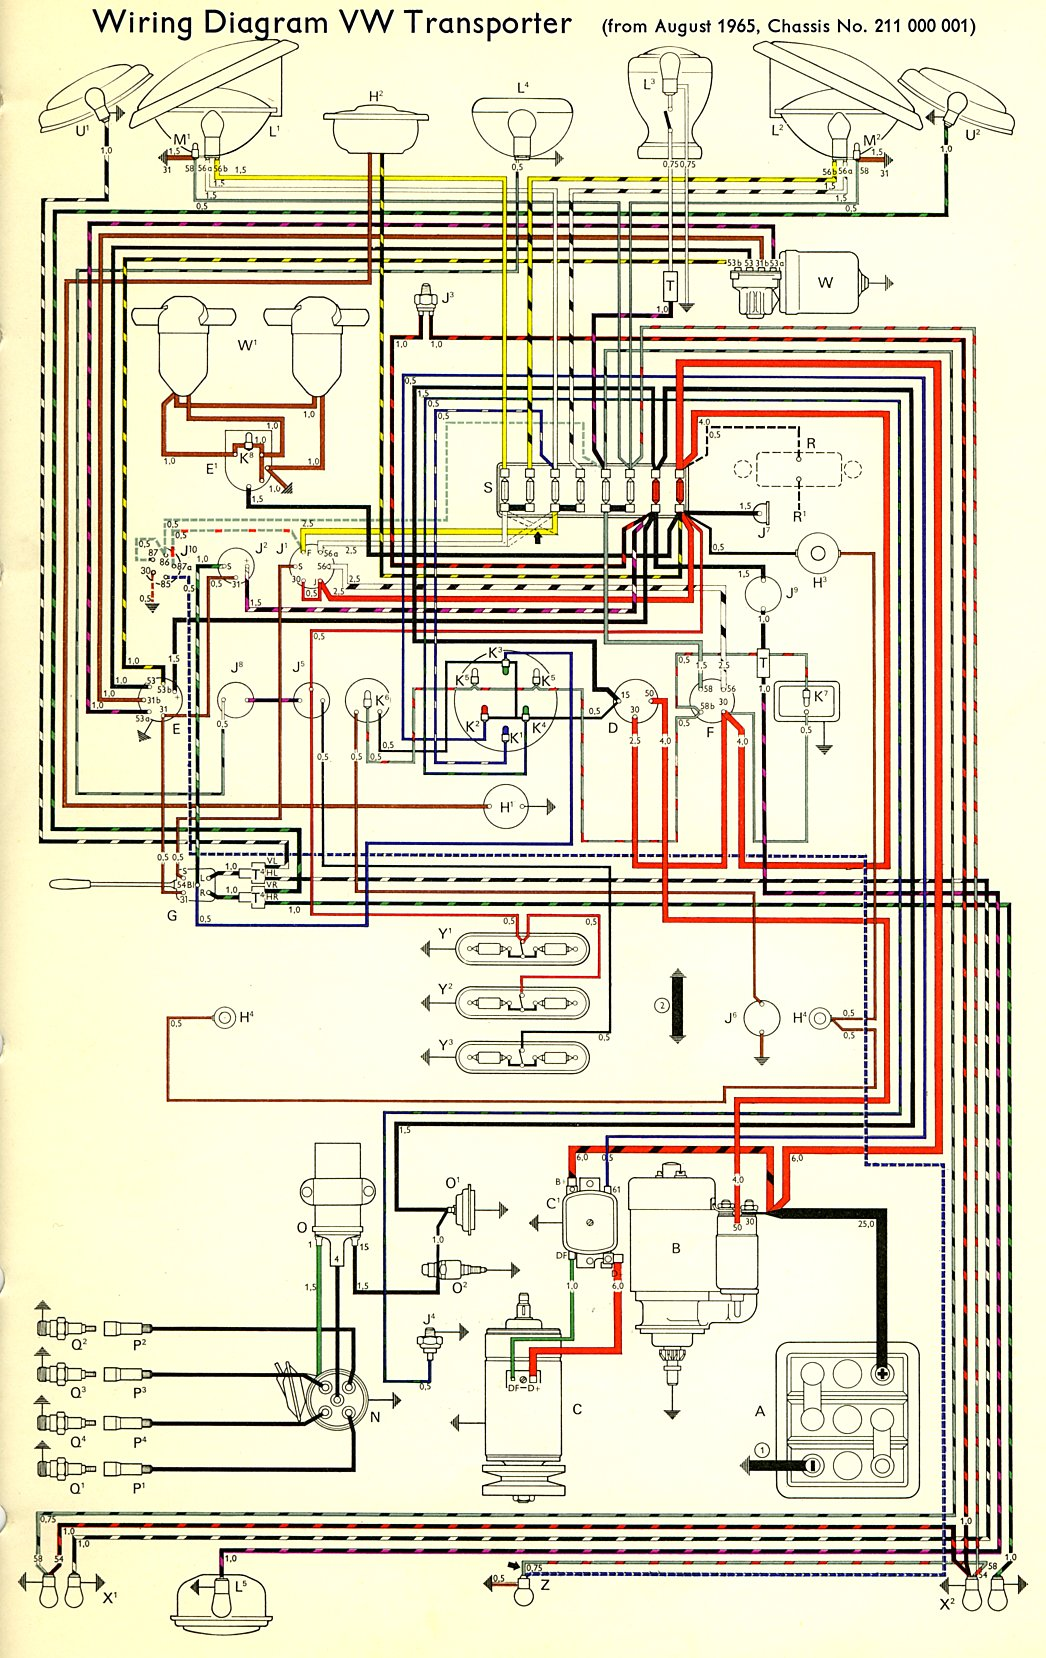 Chrysler Lebaron Fuse Box Vw Bus Wiring Diagram